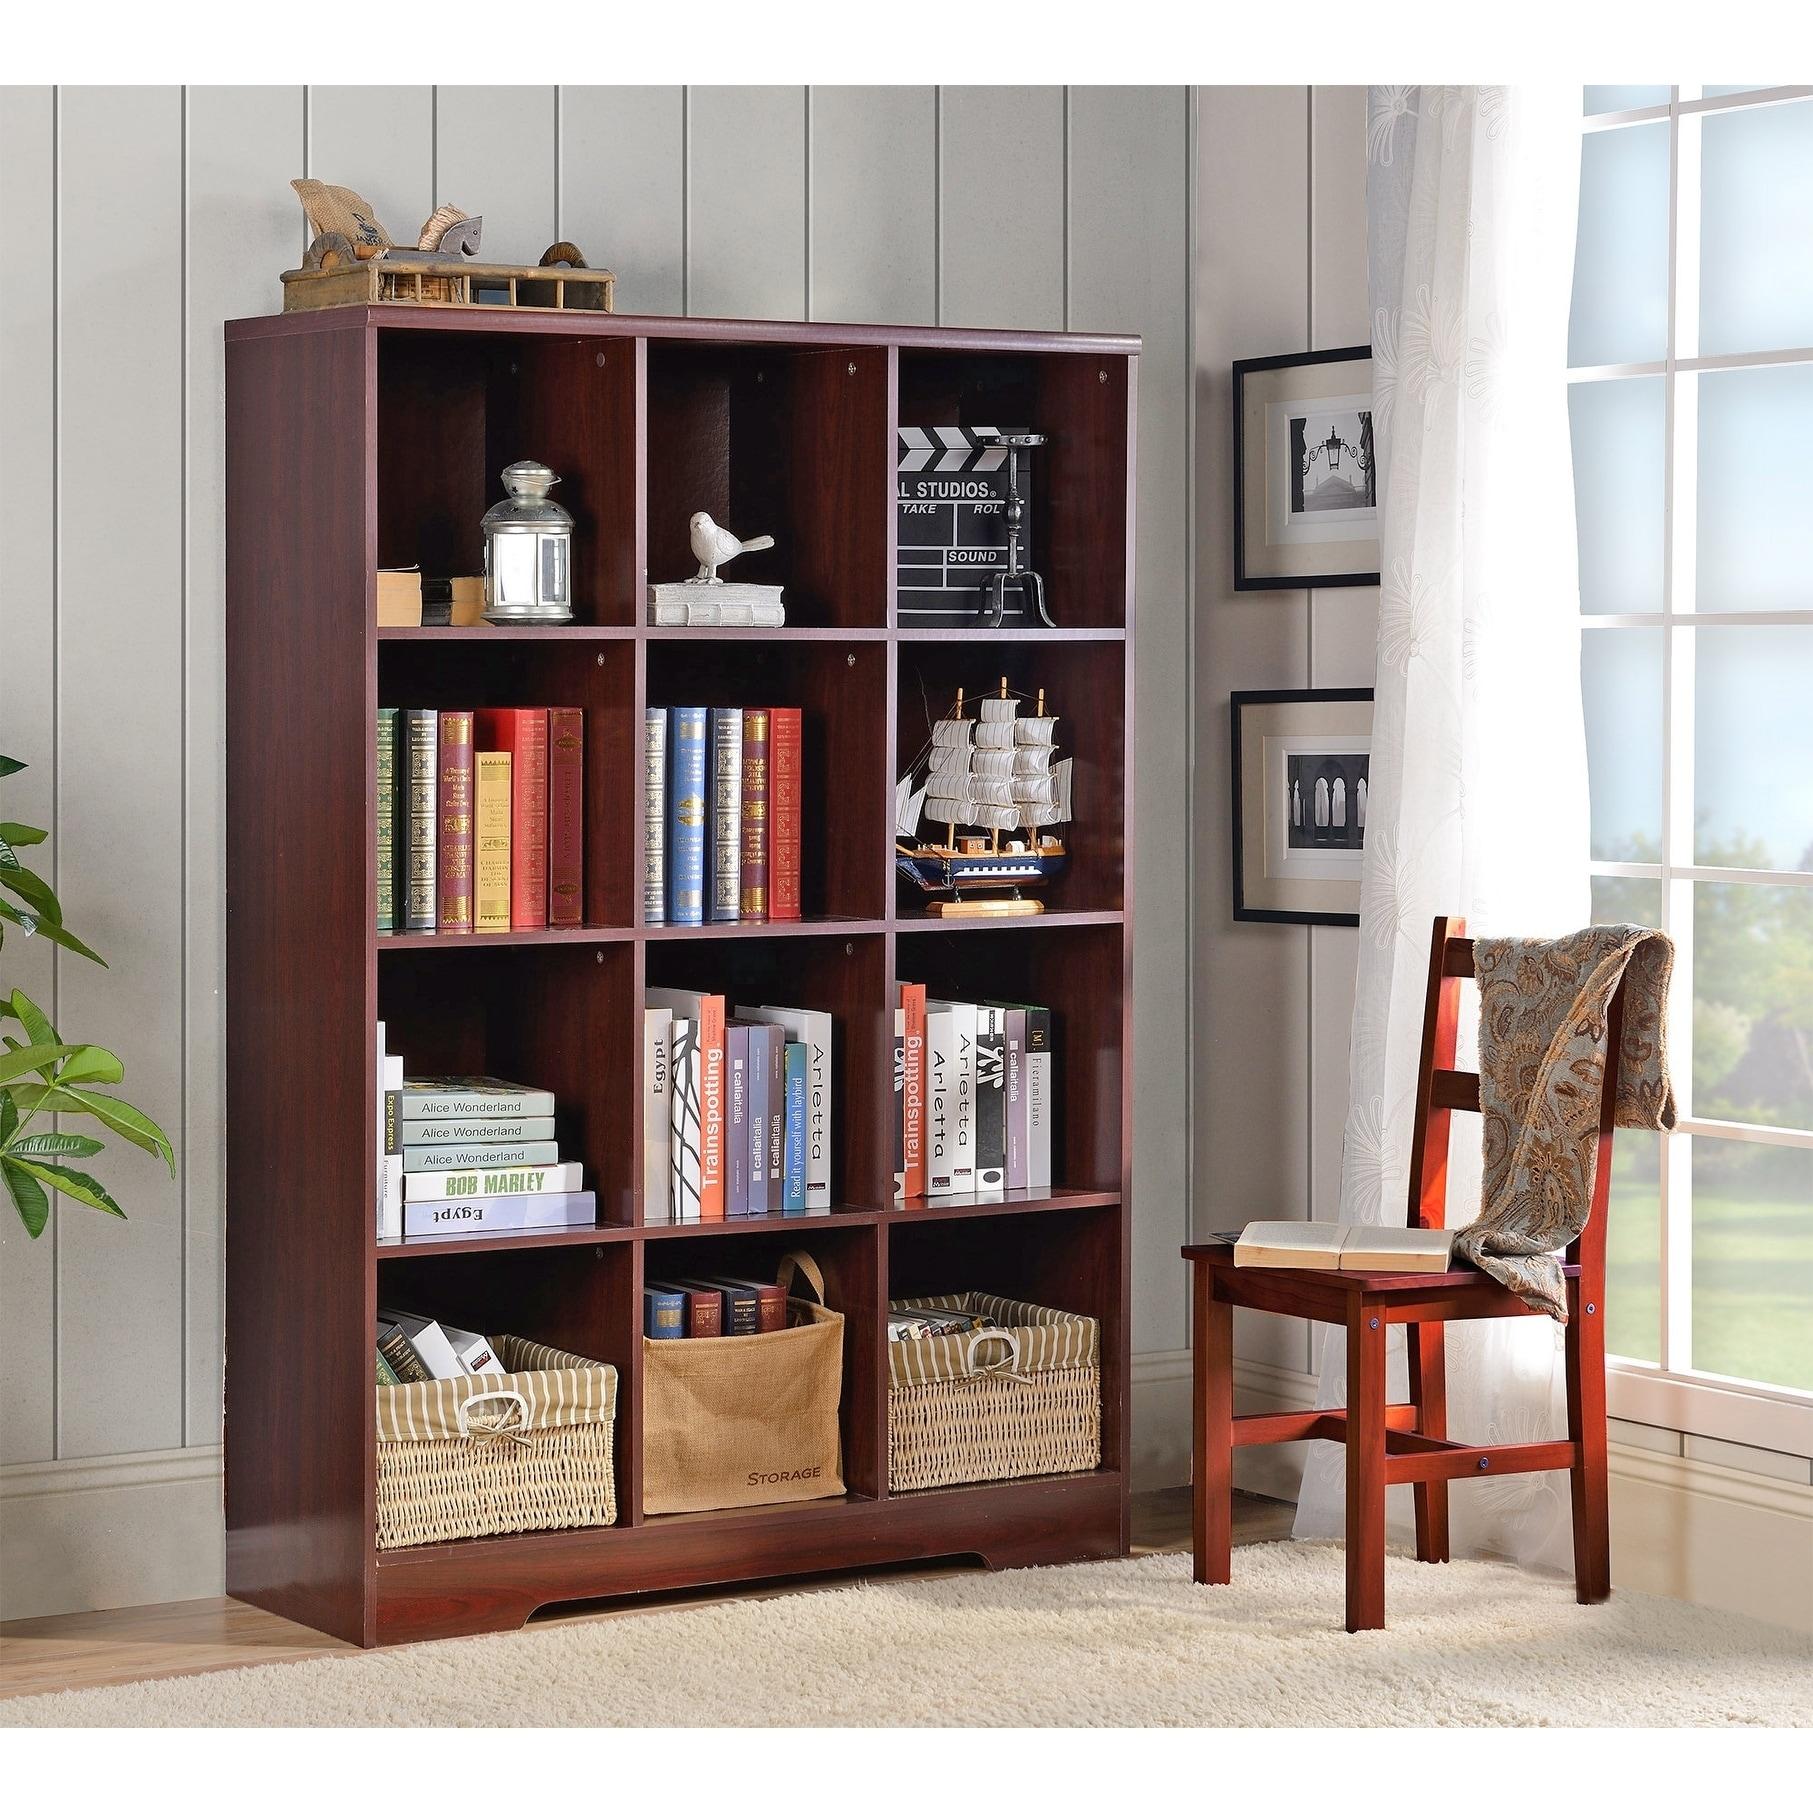 American Furniture Classics Large 12 Cube Storage Organizing Bookcase - Classic Cherry